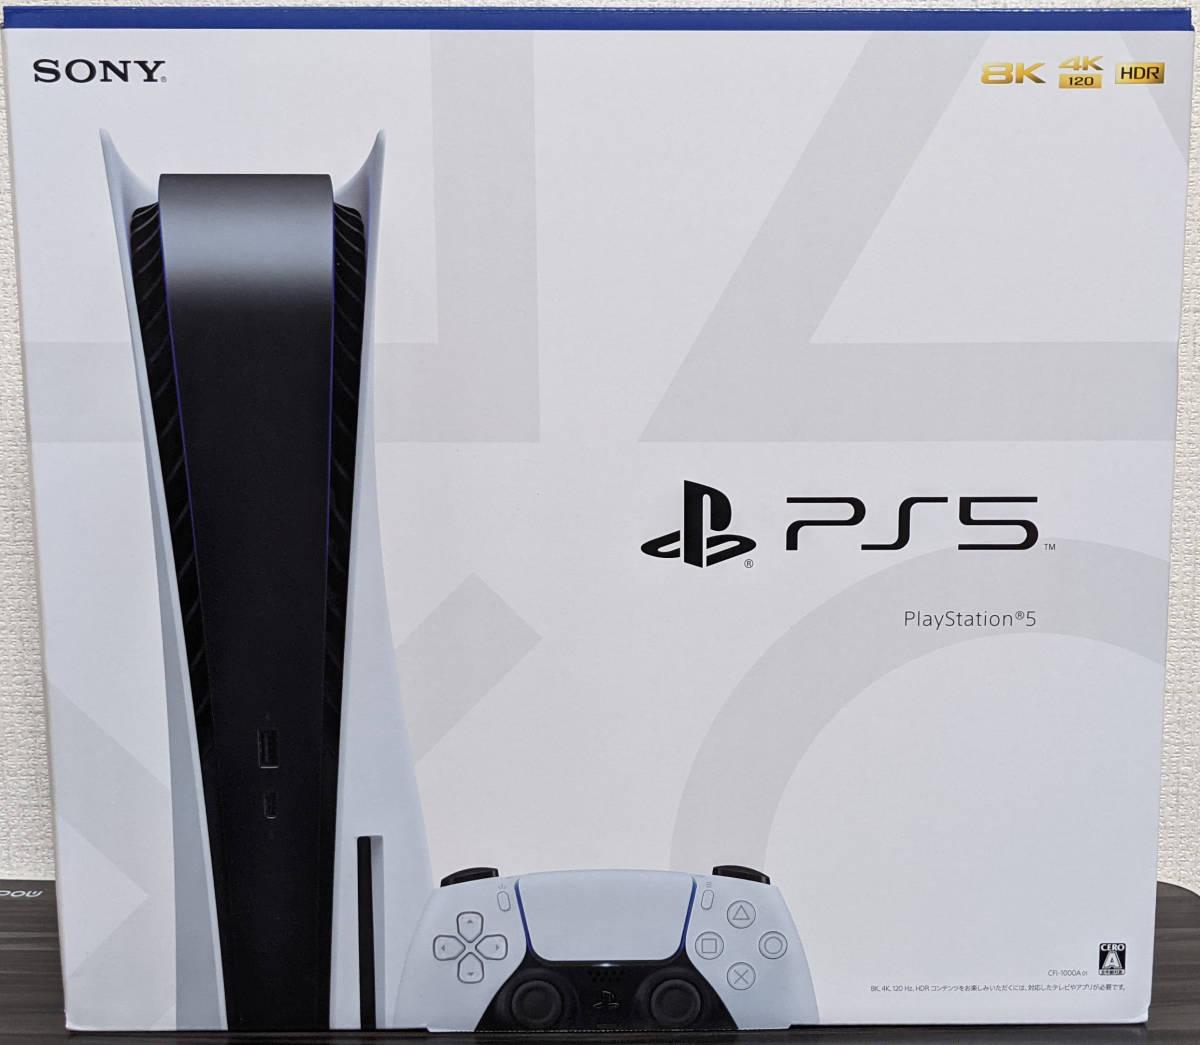 PlayStation5 CFI-1000A01 ディスクドライブ搭載モデル 日本製 純正メディアリモコン付 中古品 送料無料!